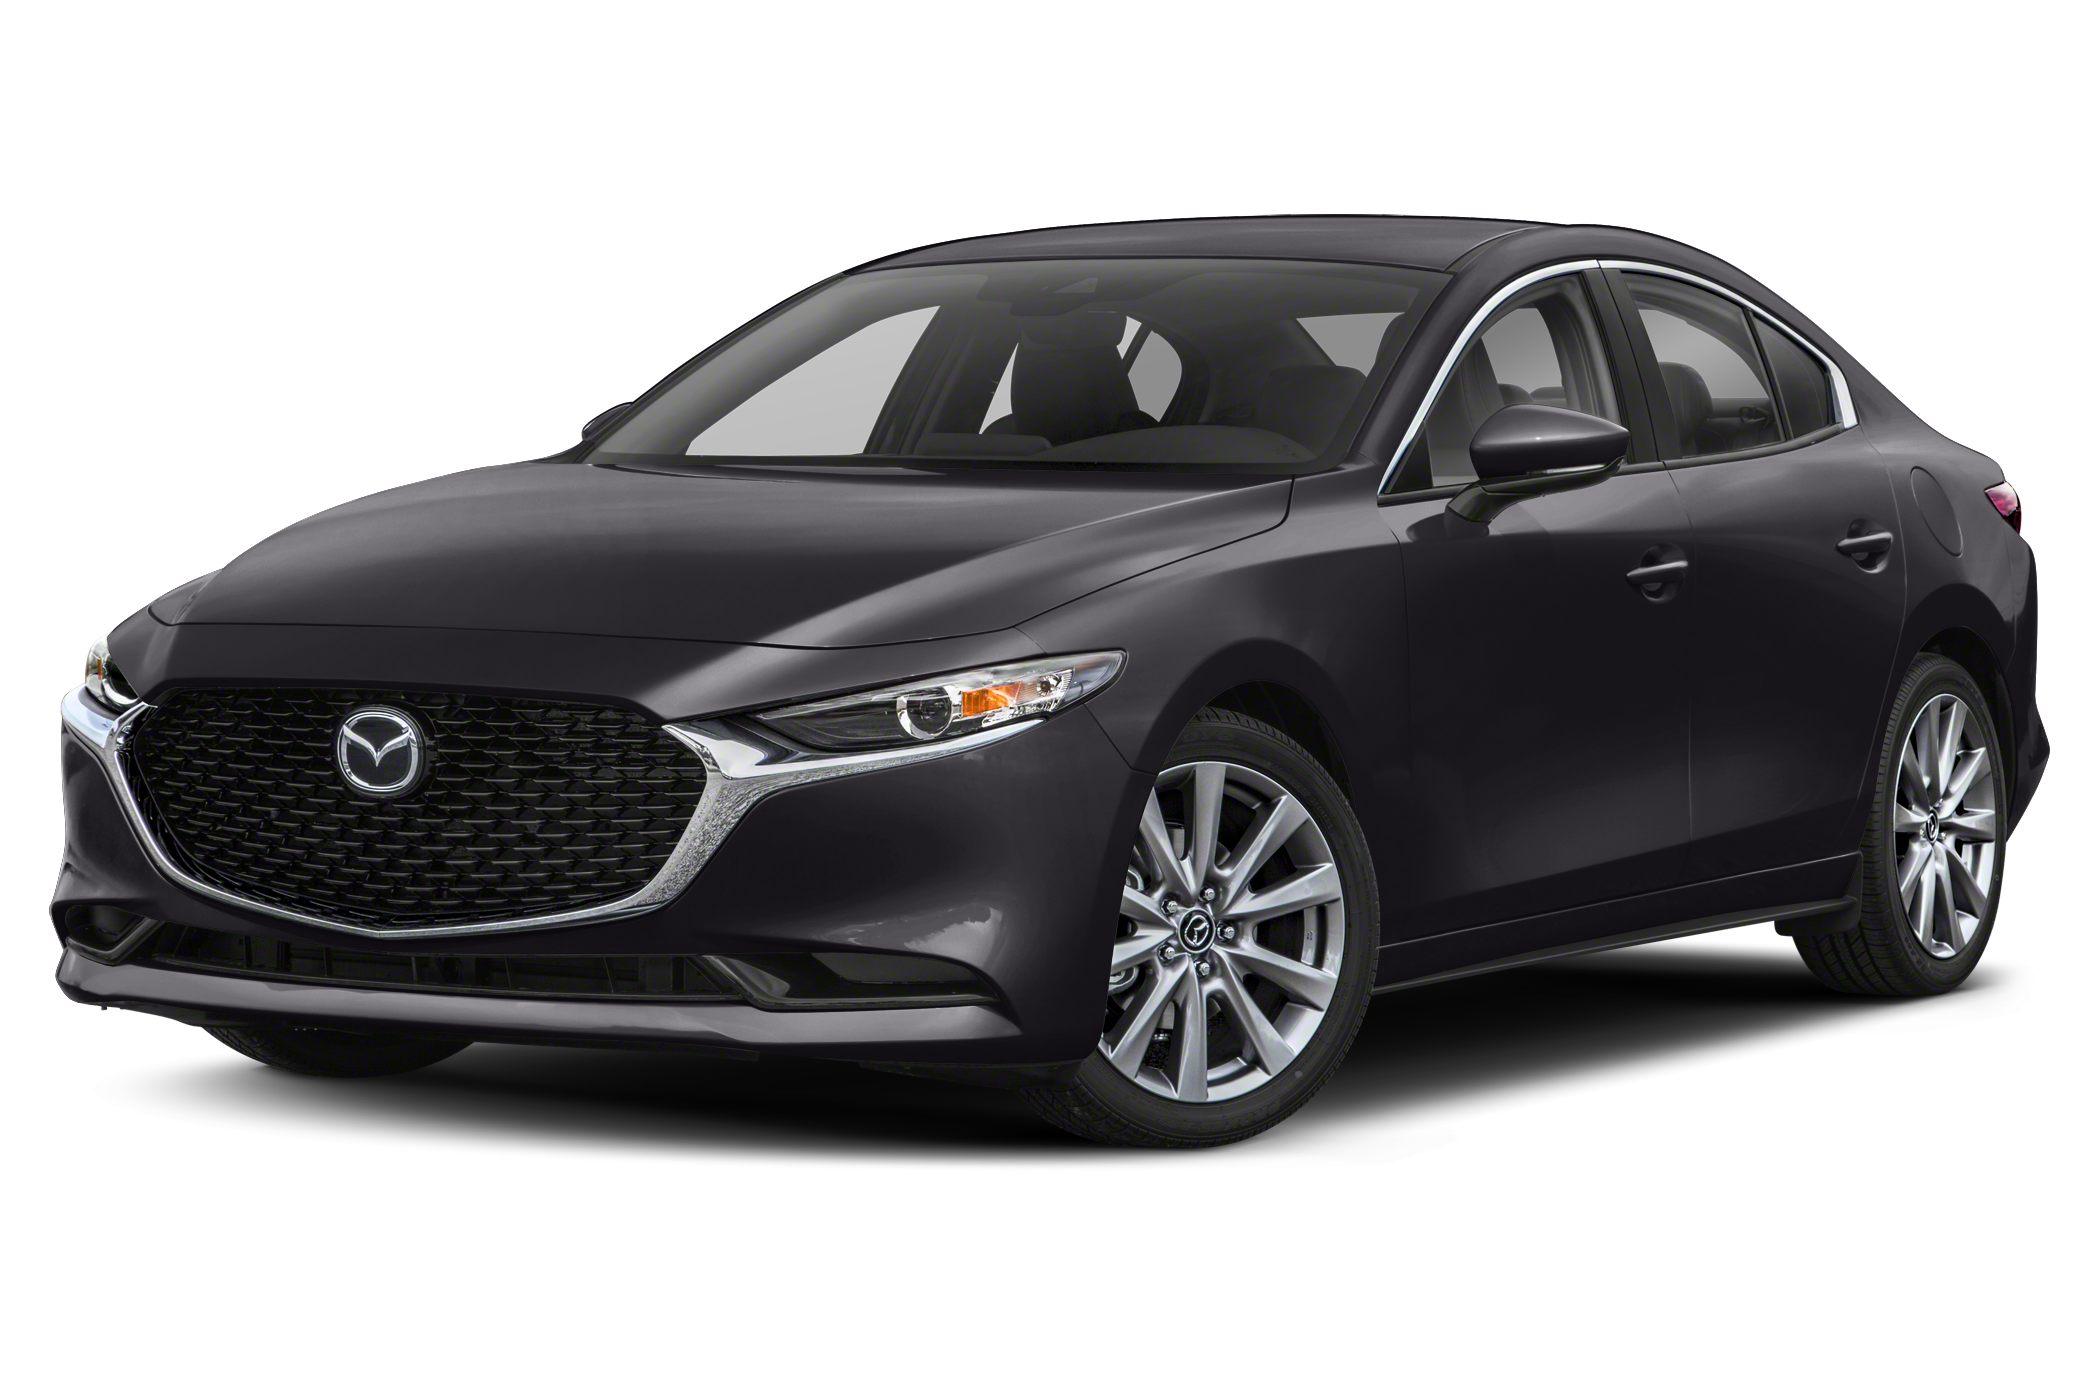 2020 Mazda Mazda3 Select Package 4dr i-ACTIV All-wheel Drive Sedan